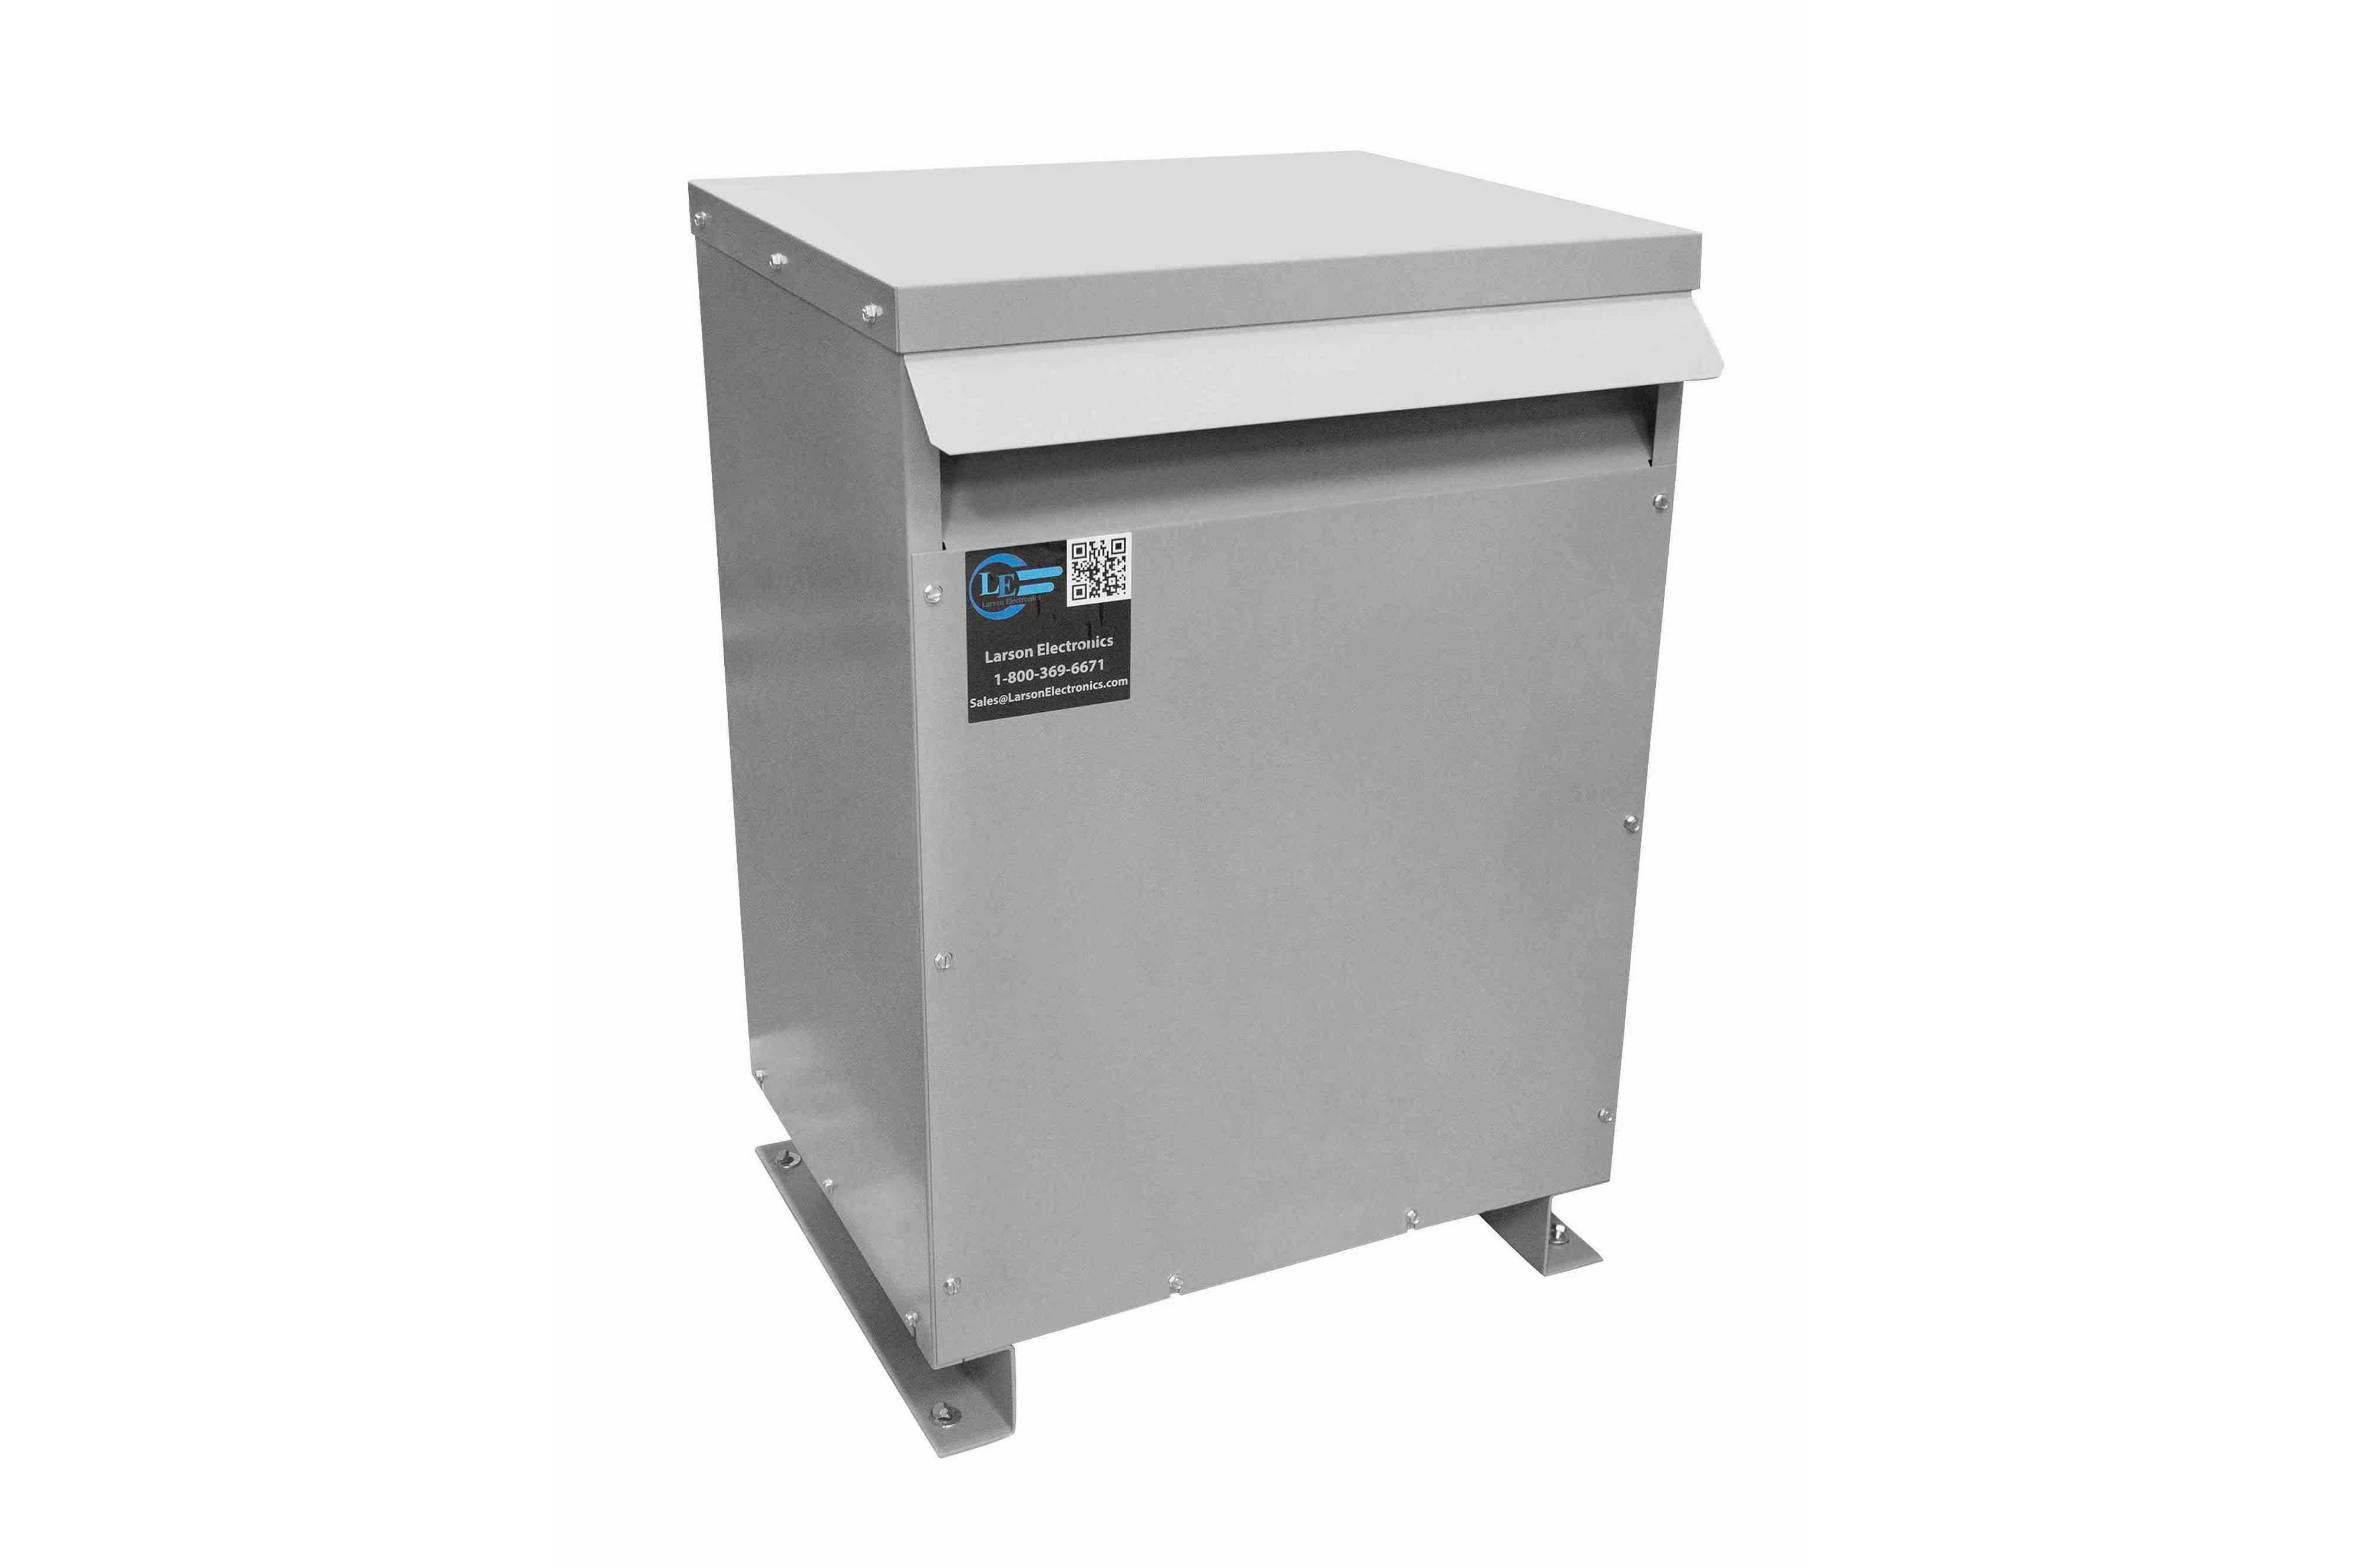 200 kVA 3PH DOE Transformer, 240V Delta Primary, 415Y/240 Wye-N Secondary, N3R, Ventilated, 60 Hz